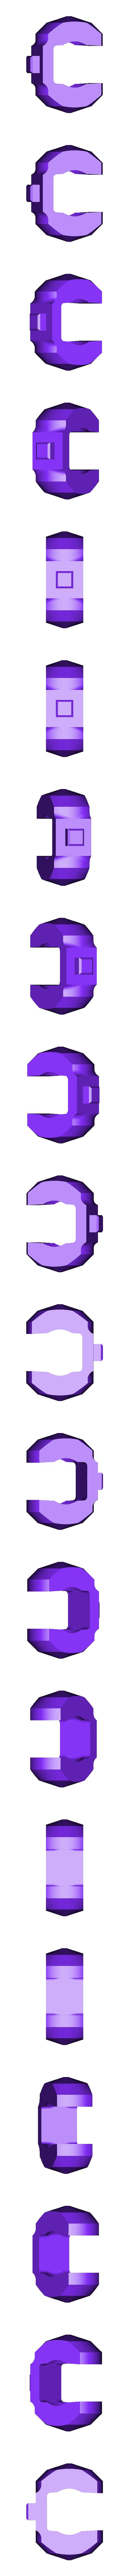 end.stl Download free STL file HeavyDuty Flexible KeyFob and Bracelet • 3D print object, hitchabout